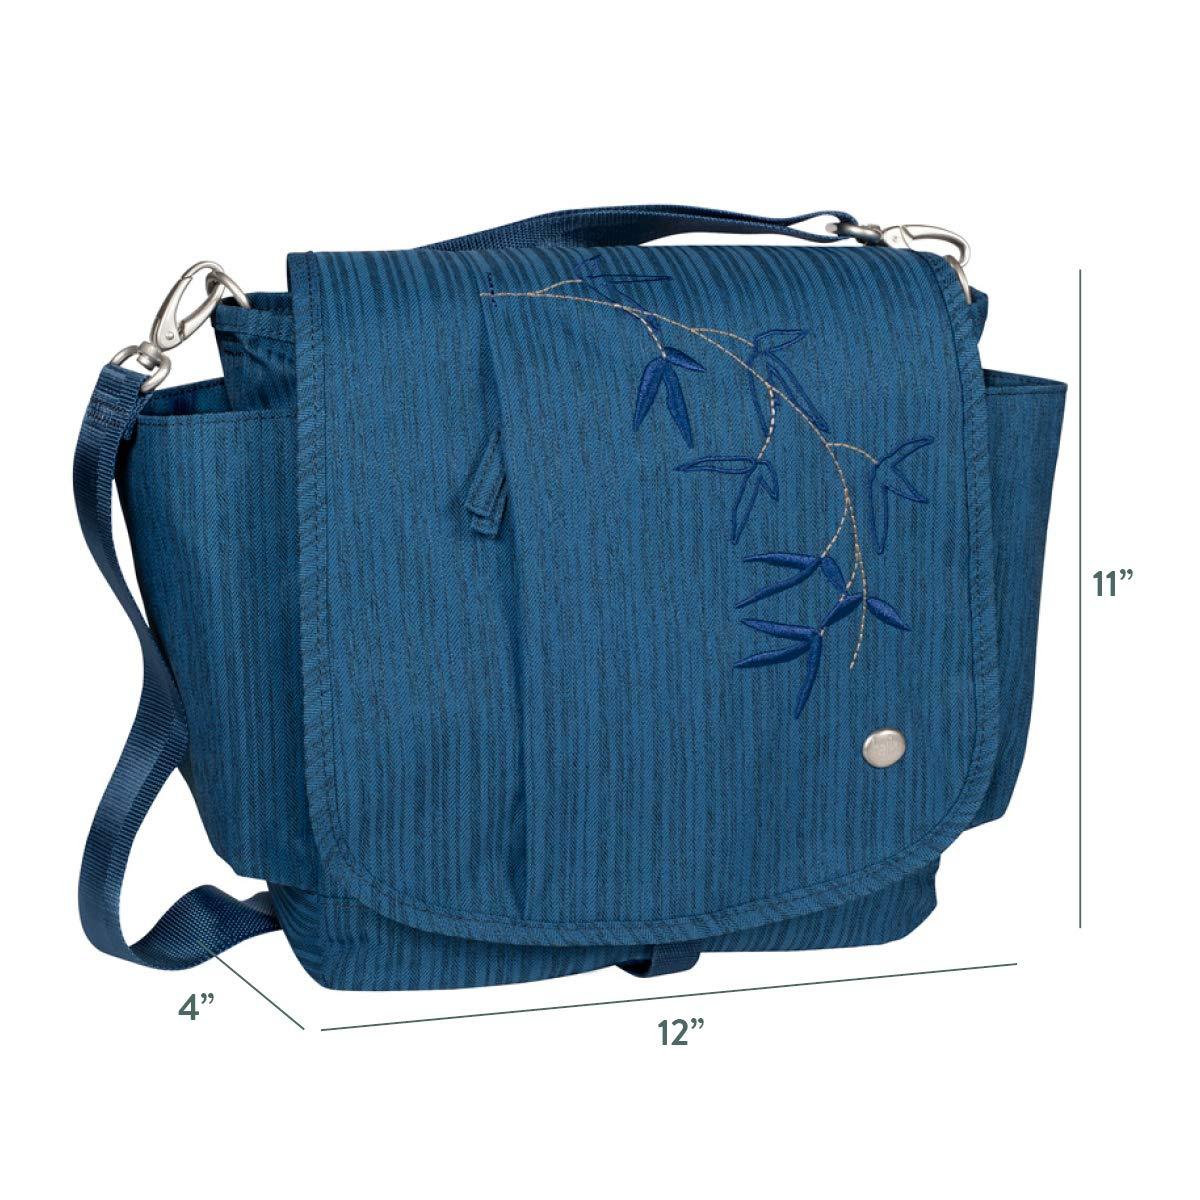 HAIKU Womens to Go Convertible Eco-Friendly Crossbody Travel Messenger Bag